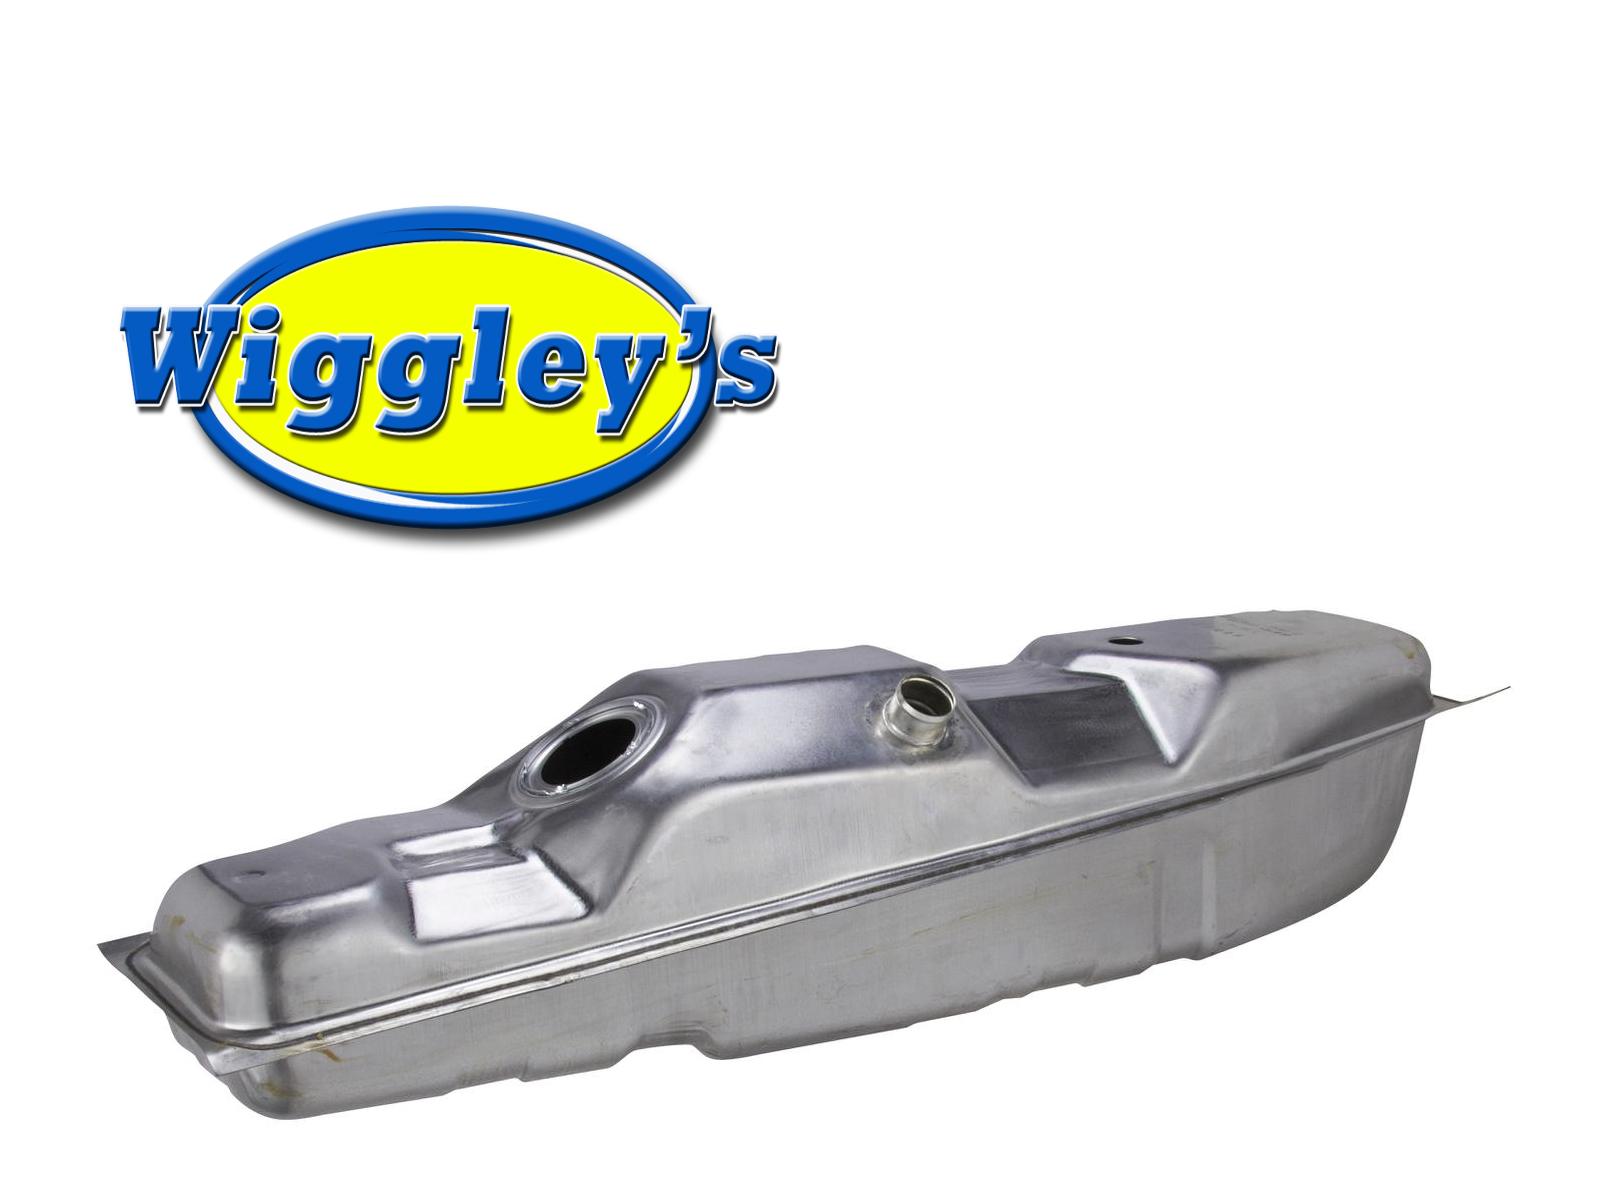 GAS/DIESEL FUEL TANK IF21C, F21C FITS 85 86 87 88 FORD RANGER Fits Rubber Filler